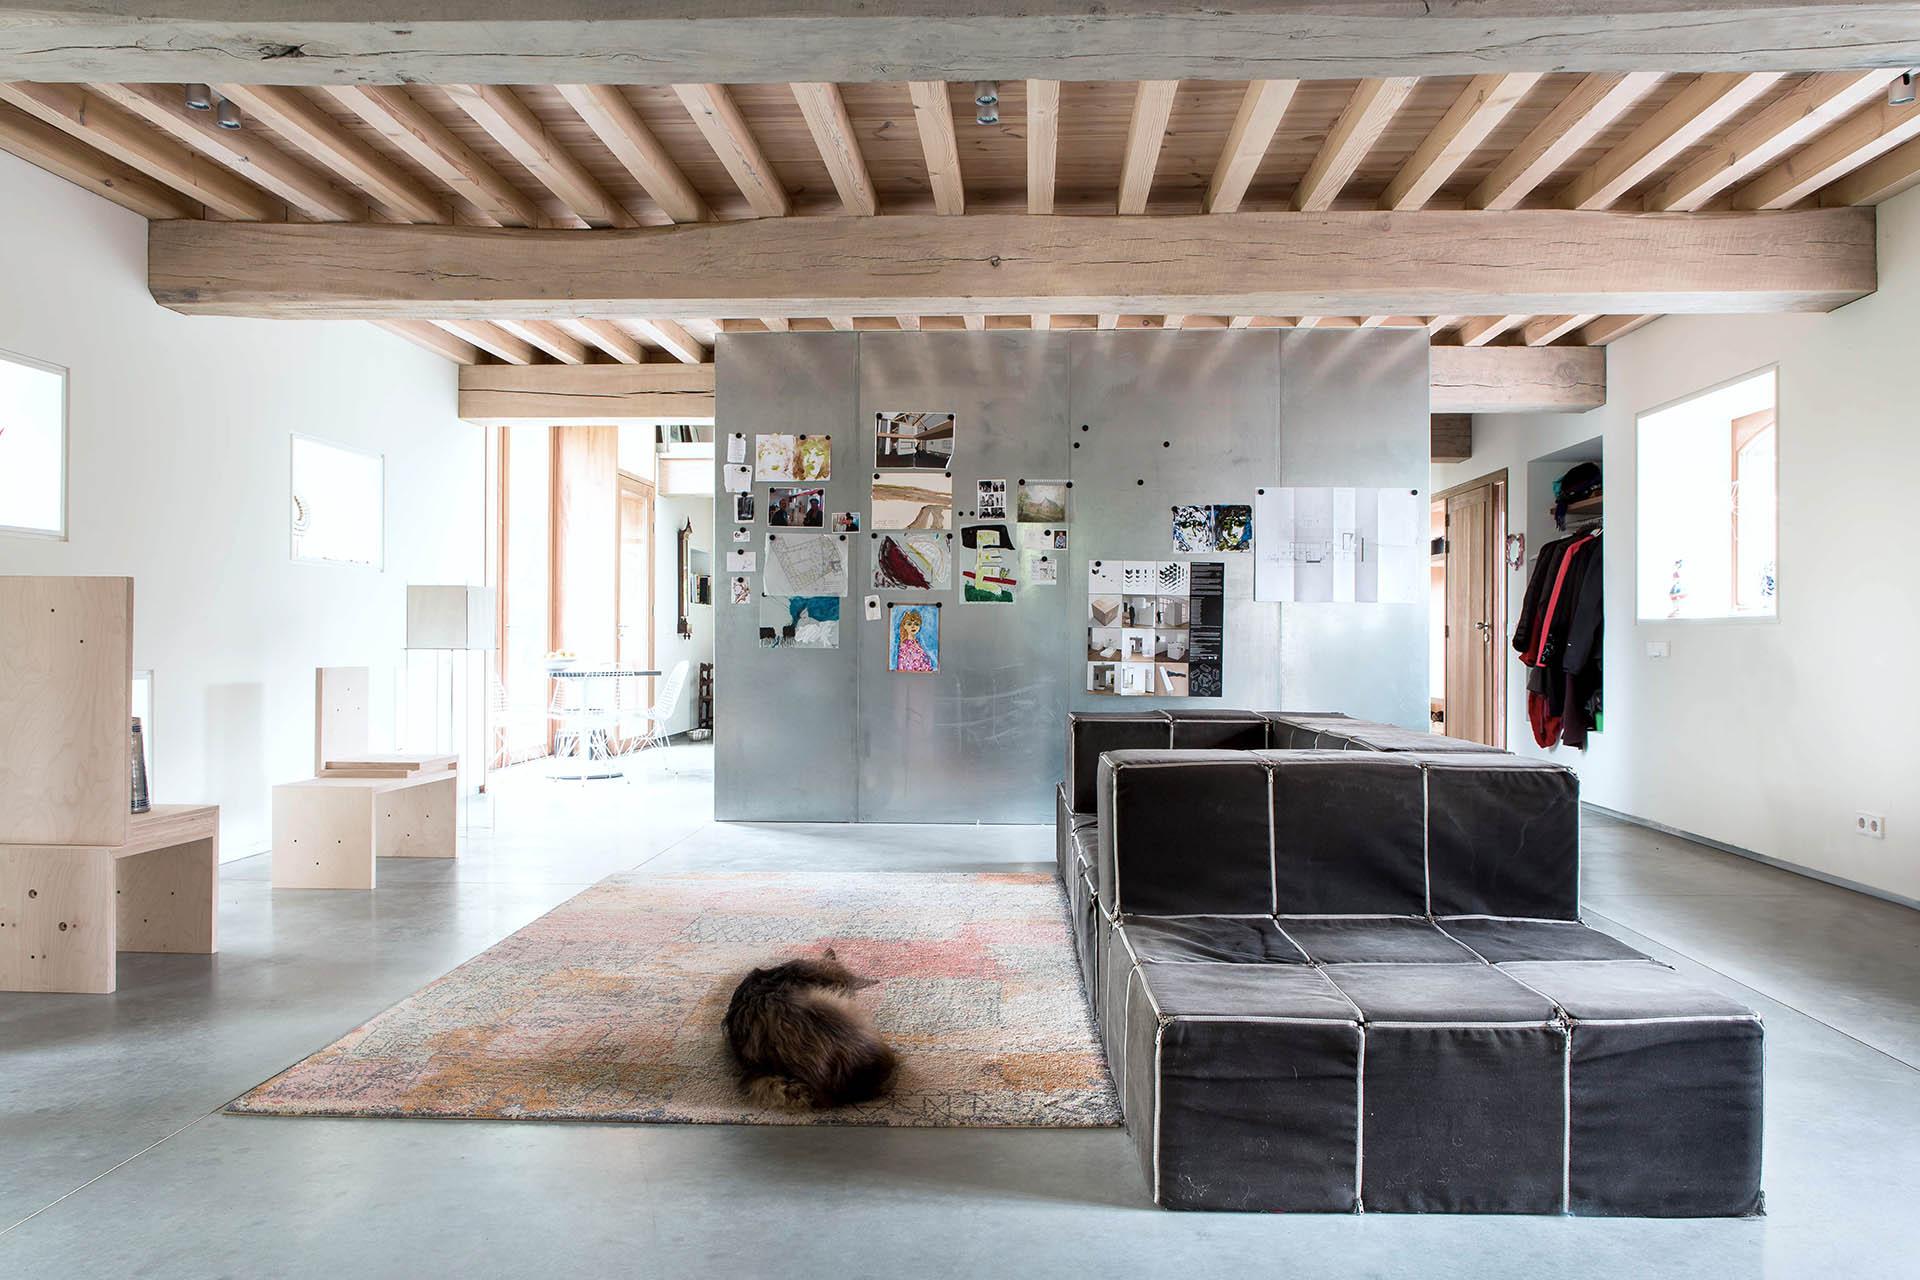 interieur staal hout beton design bank kubus licht eikenhout interieur